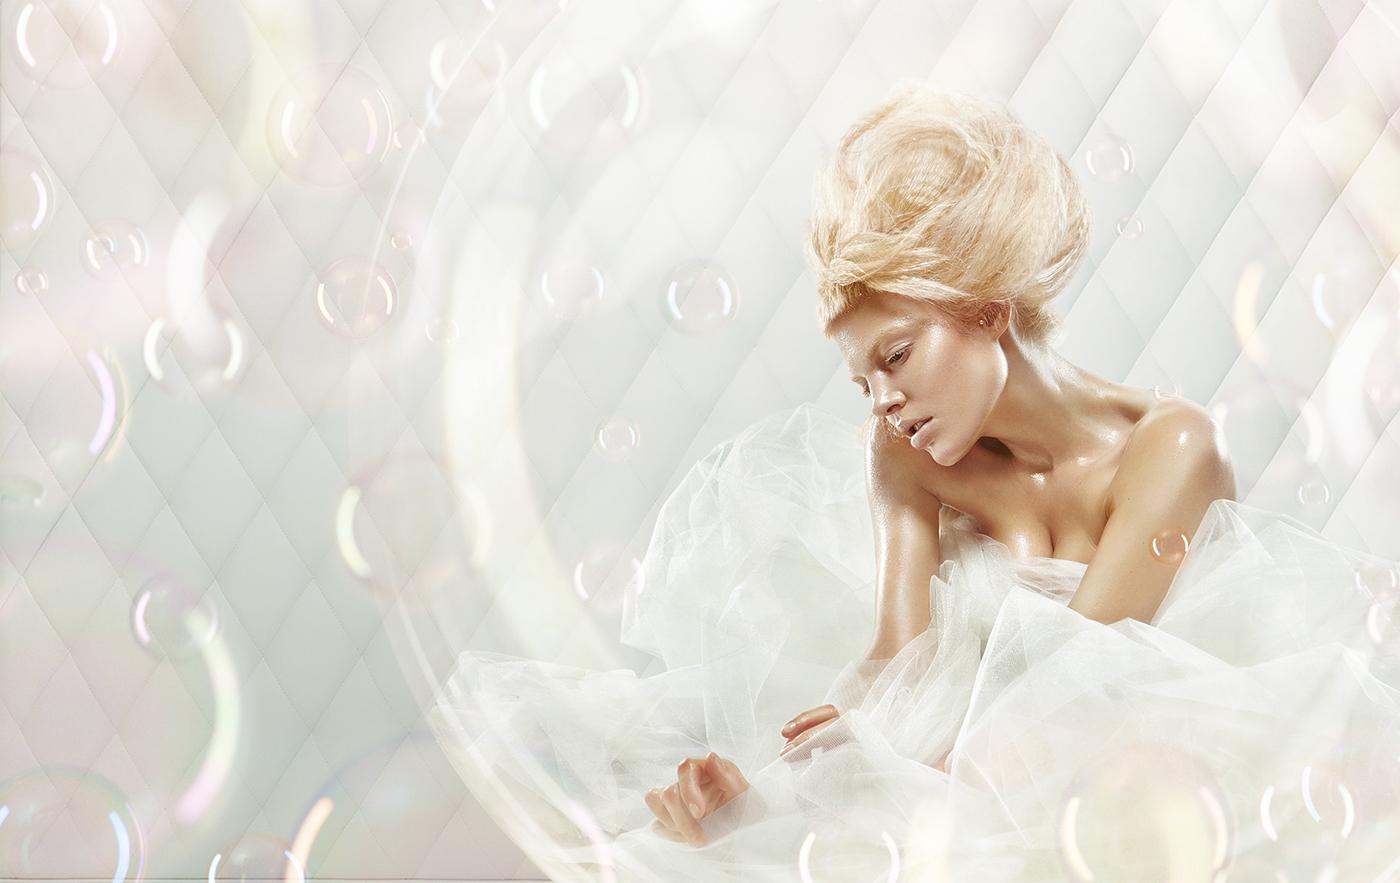 bigfishhouse postproduction ArtDirection creative beauty MUA hairstyle glance editorial